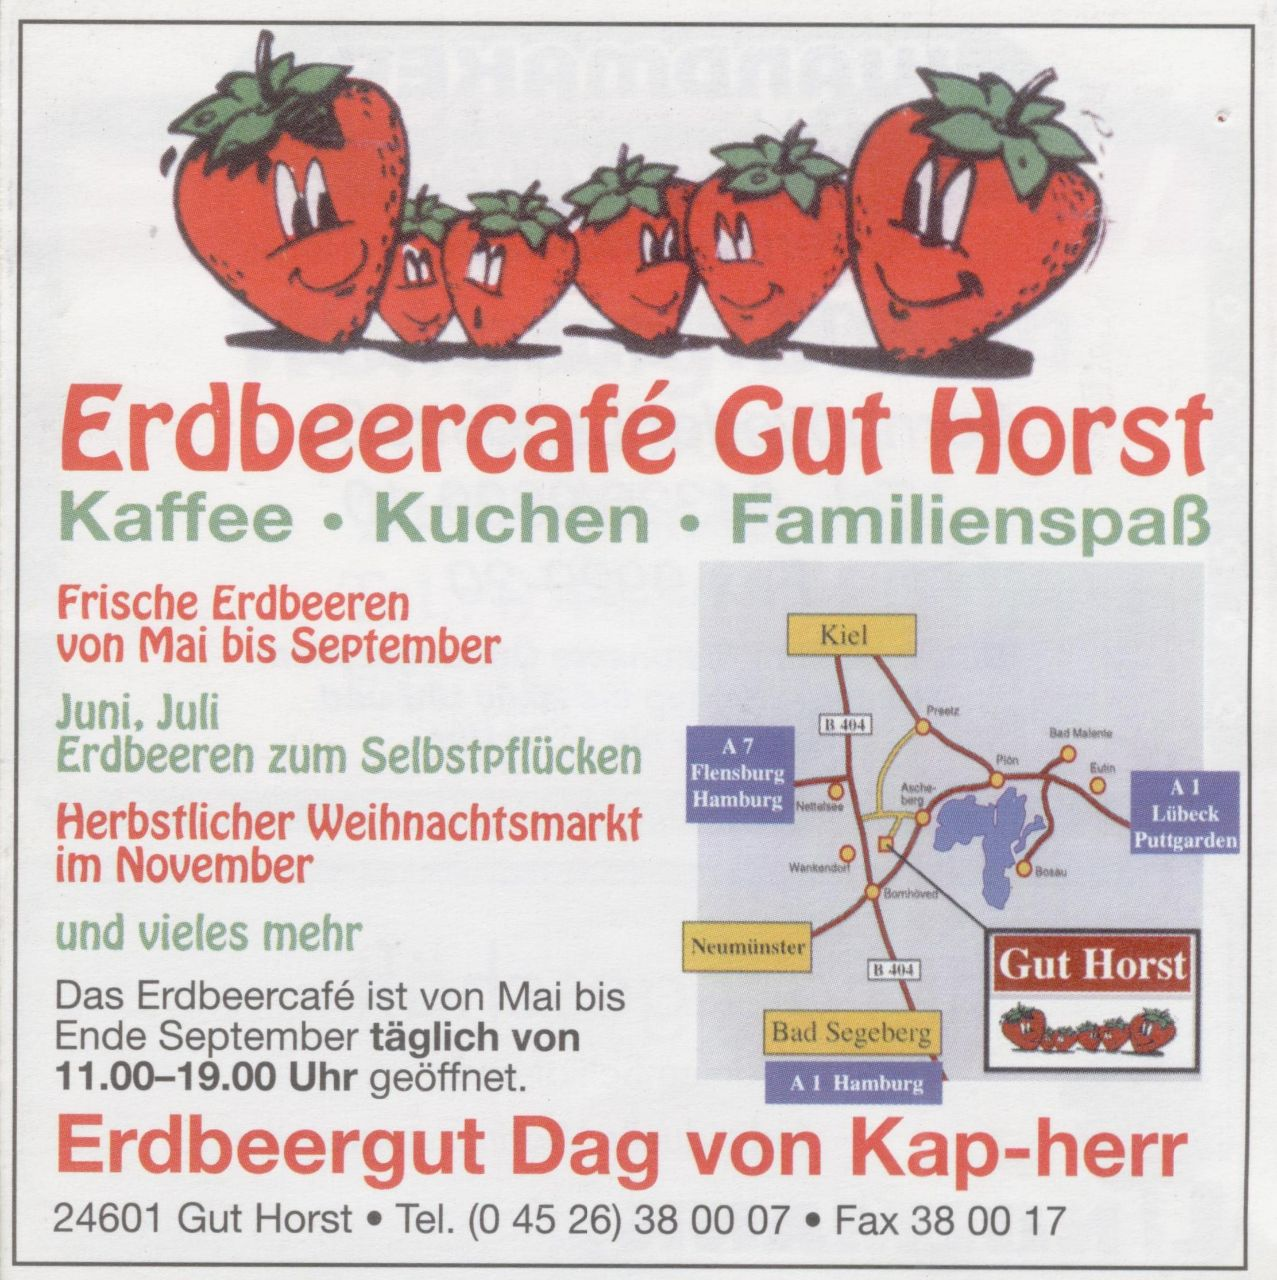 Erdbeercafé Gut Horst